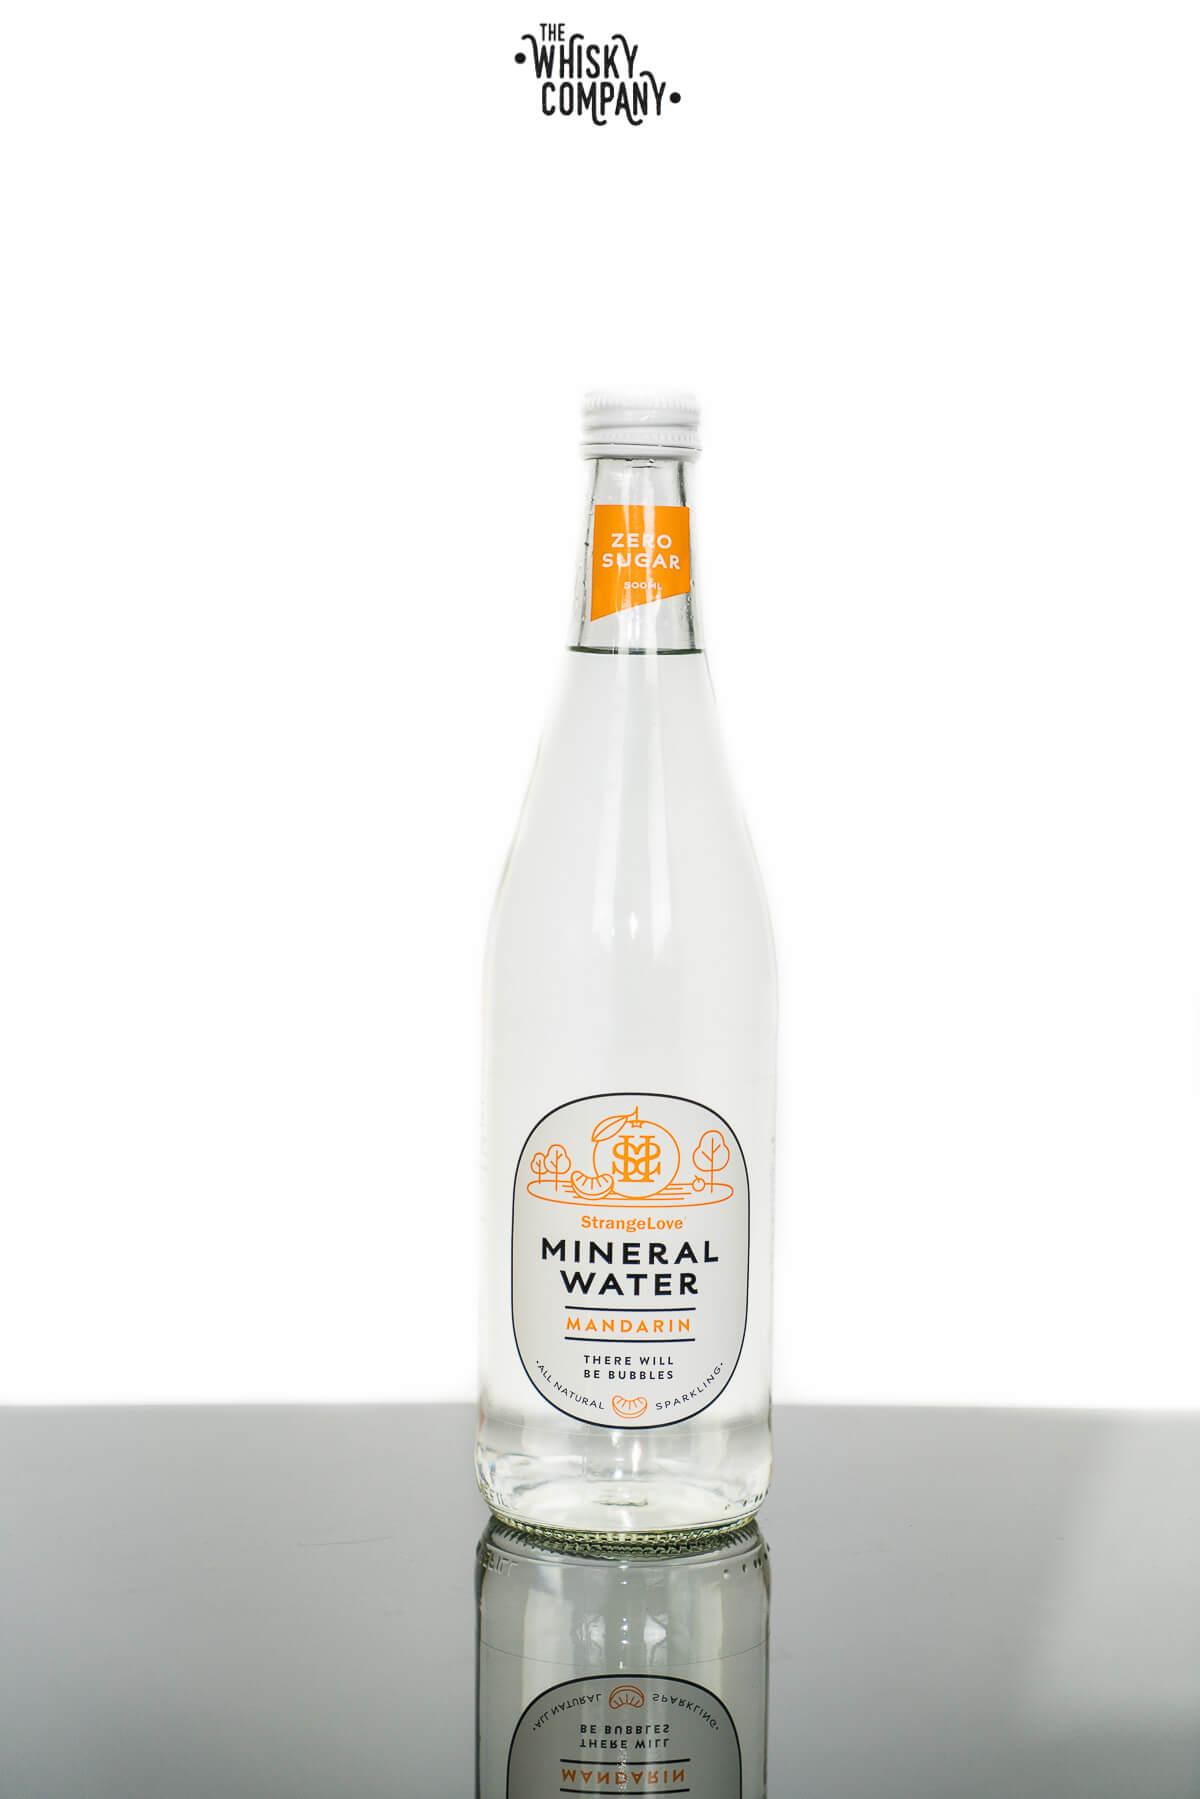 StrangeLove Mandarin Mineral Water (500ml)